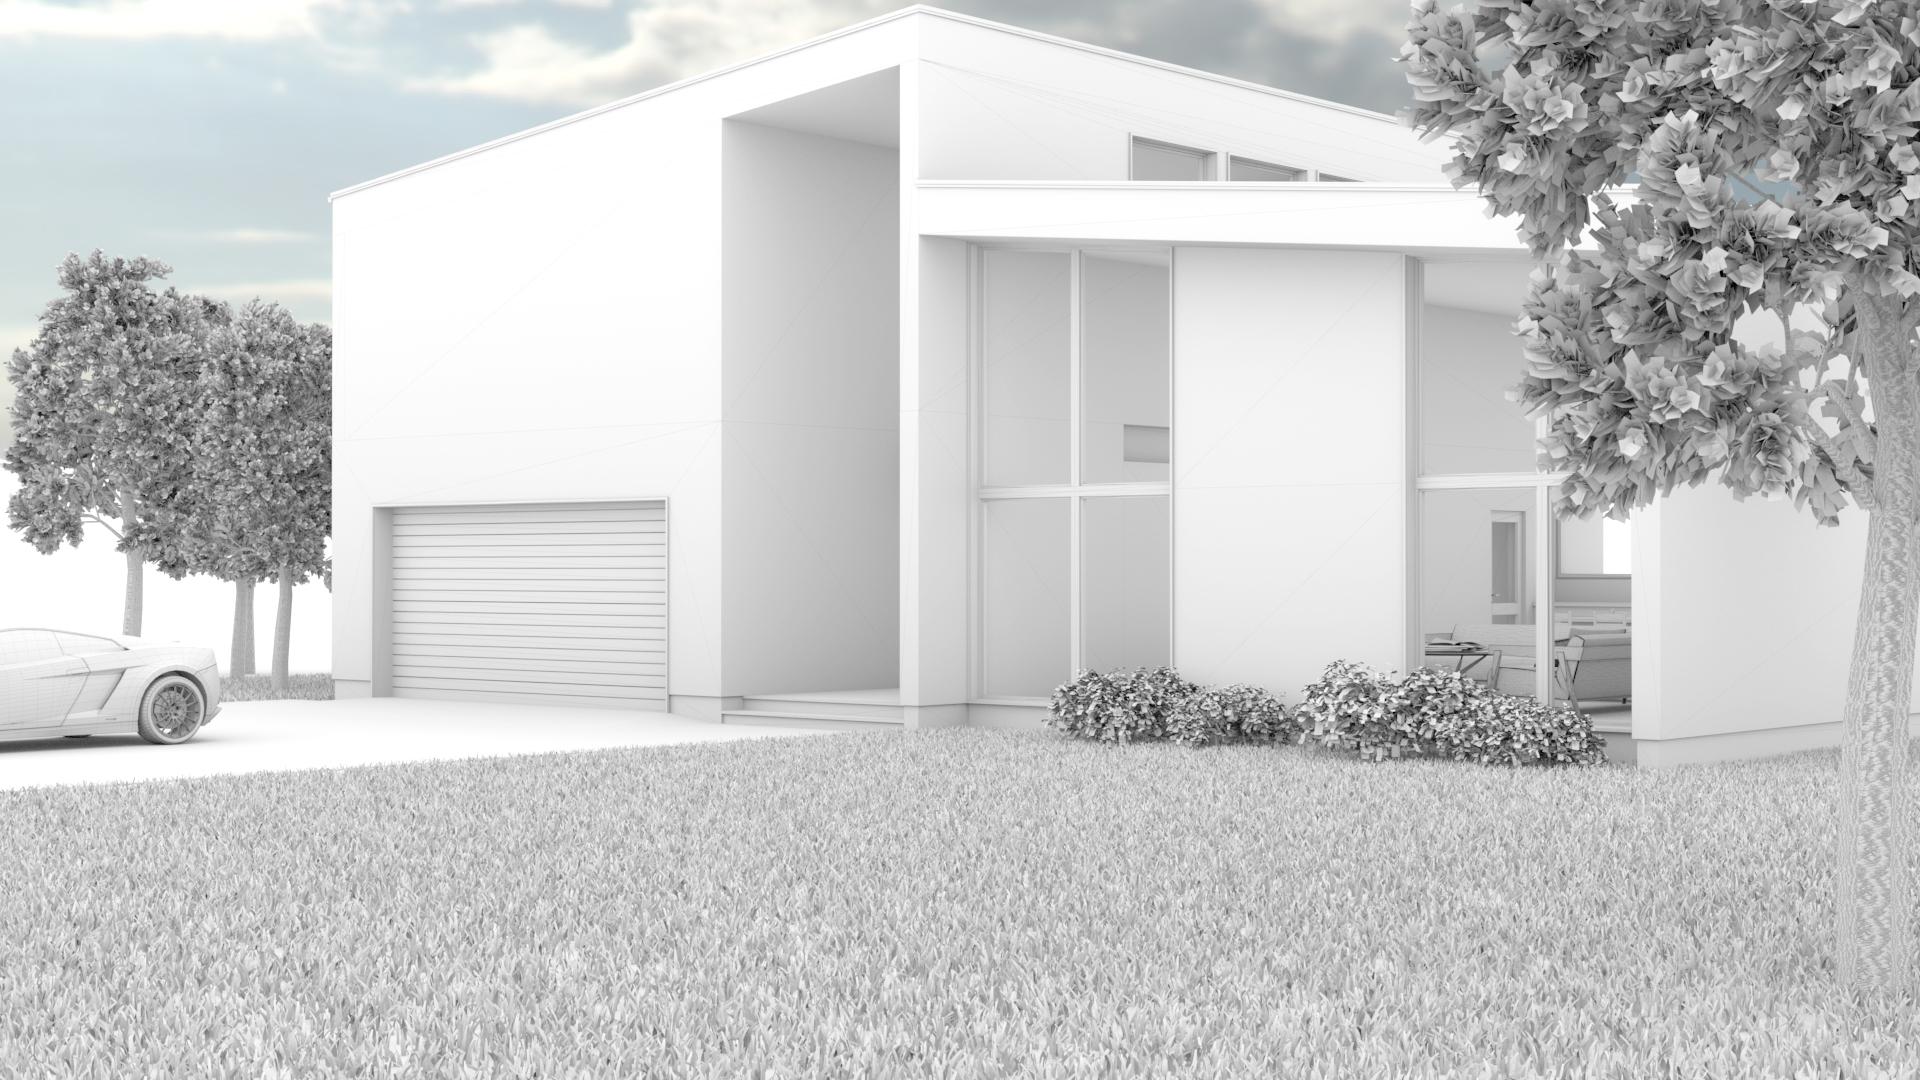 Modern House wireframe